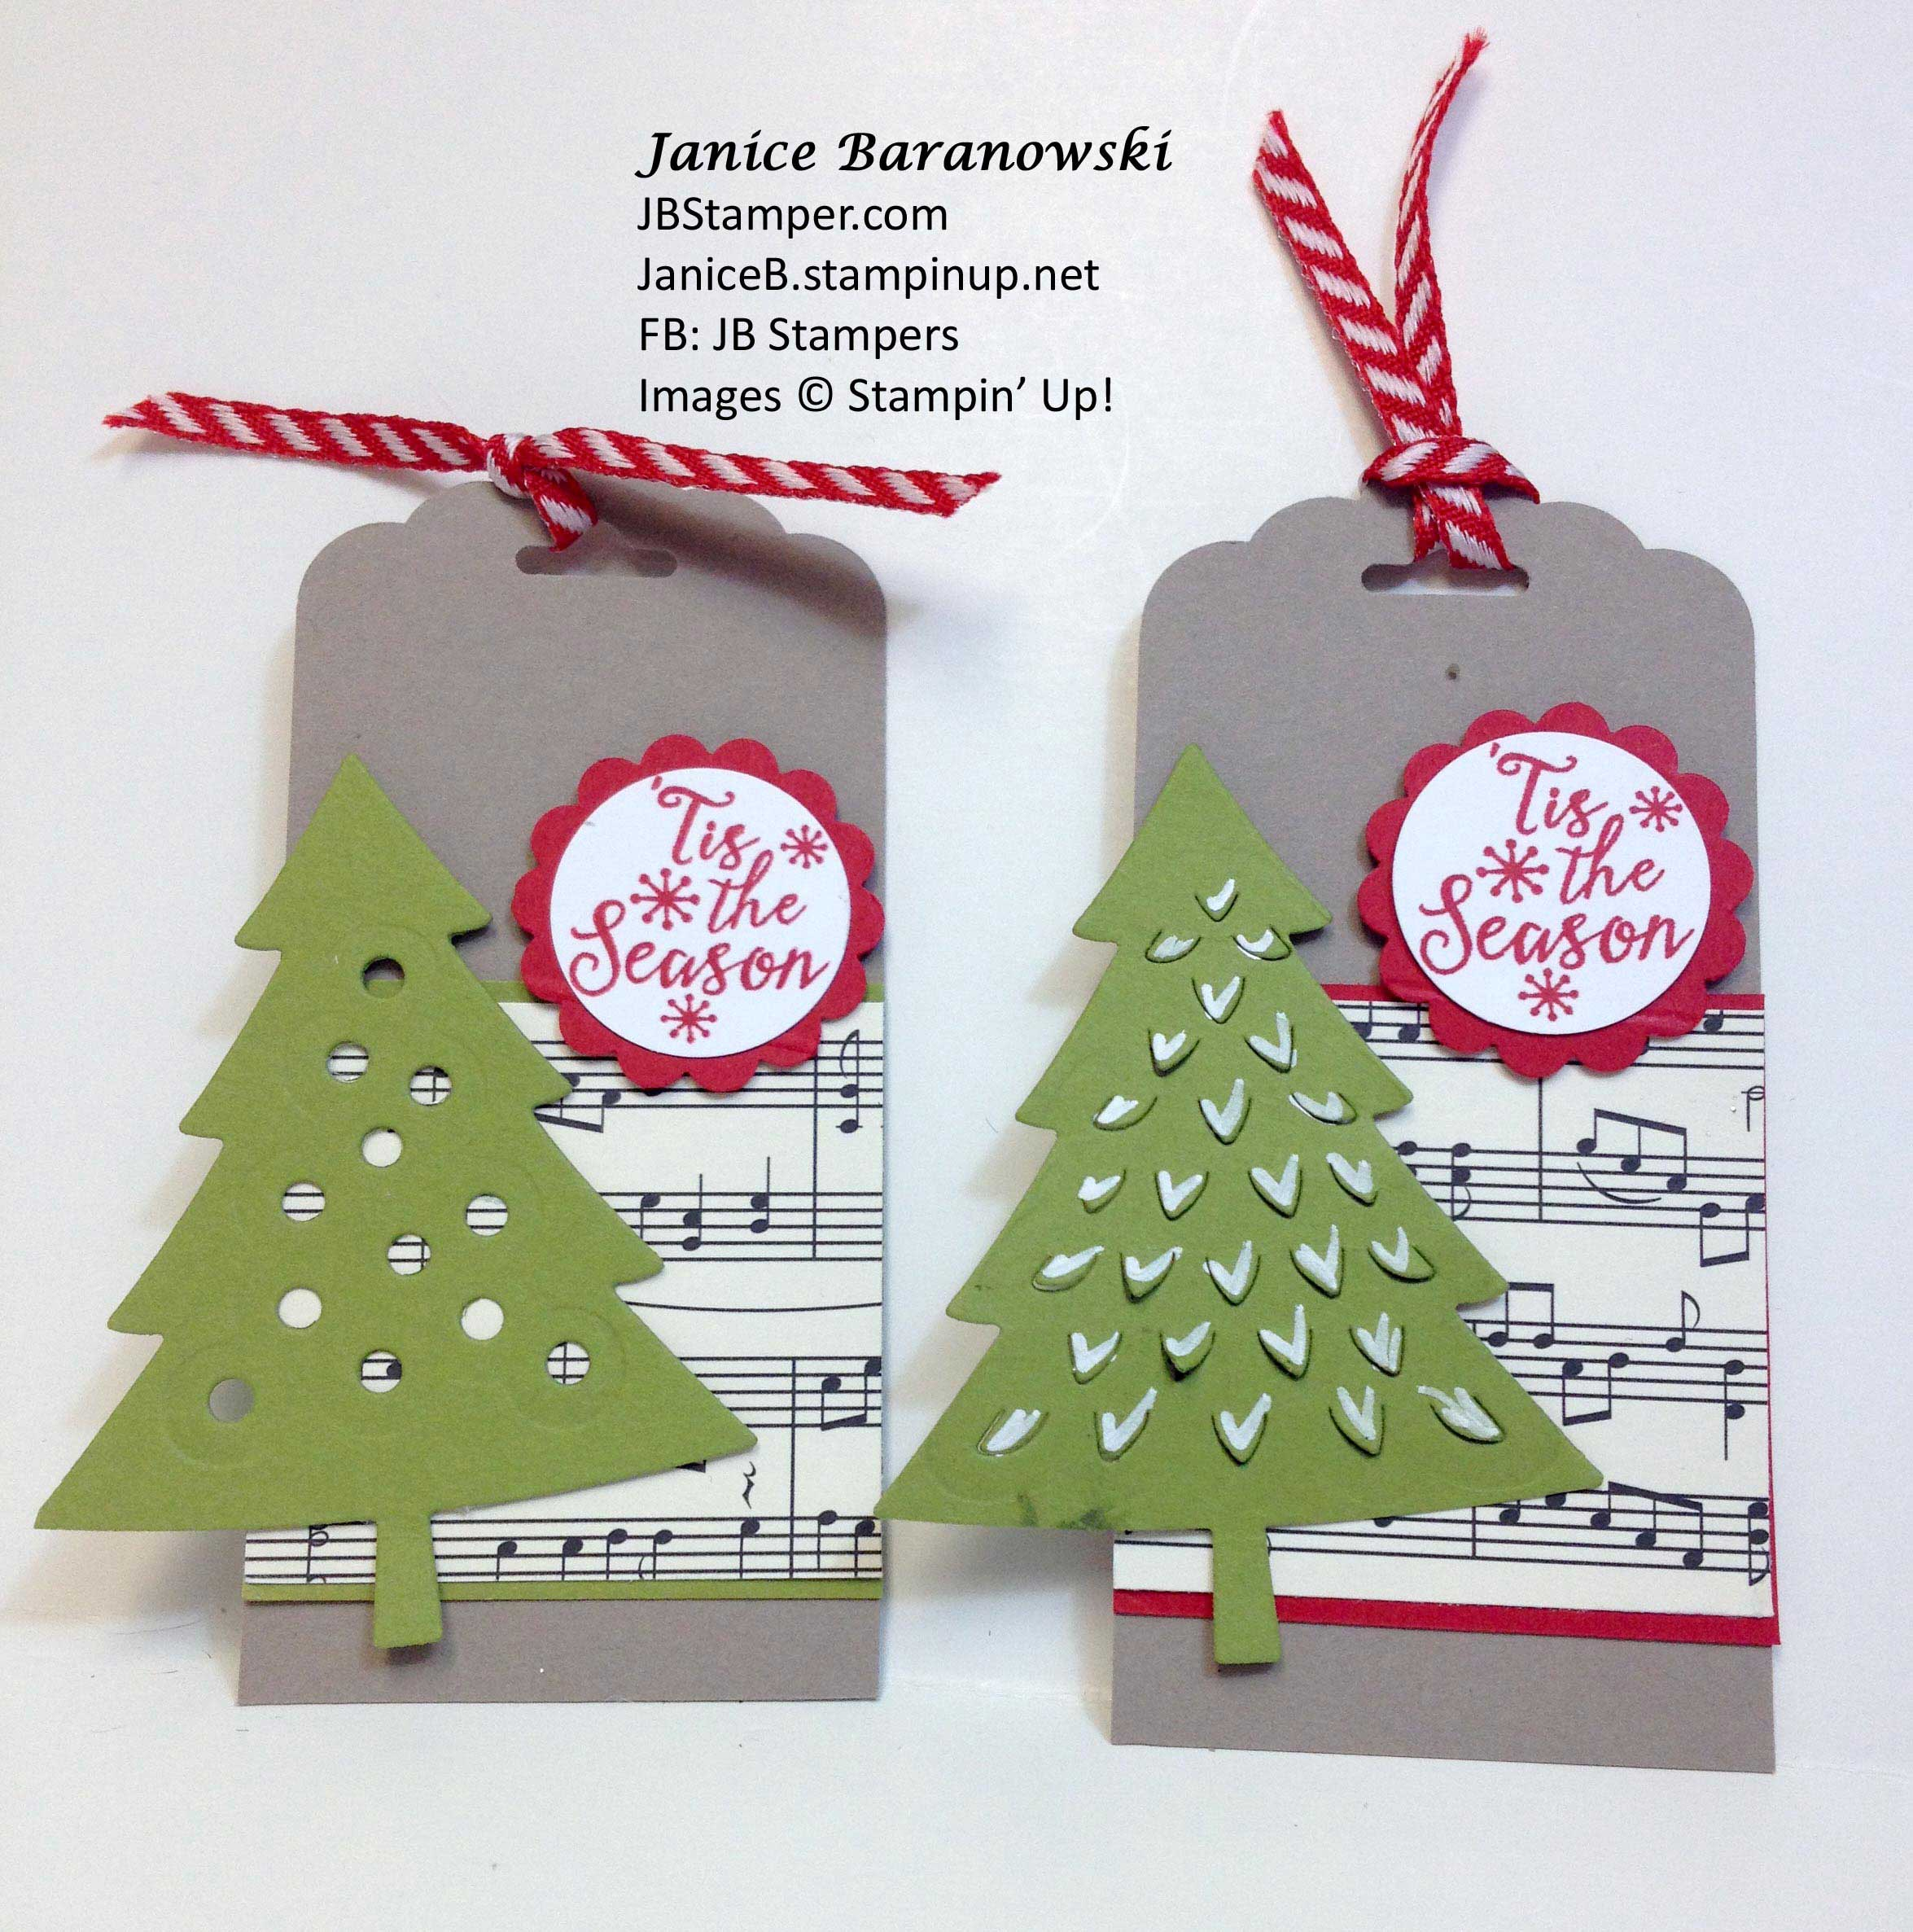 ChristmasTreetags-sm-JBStamper